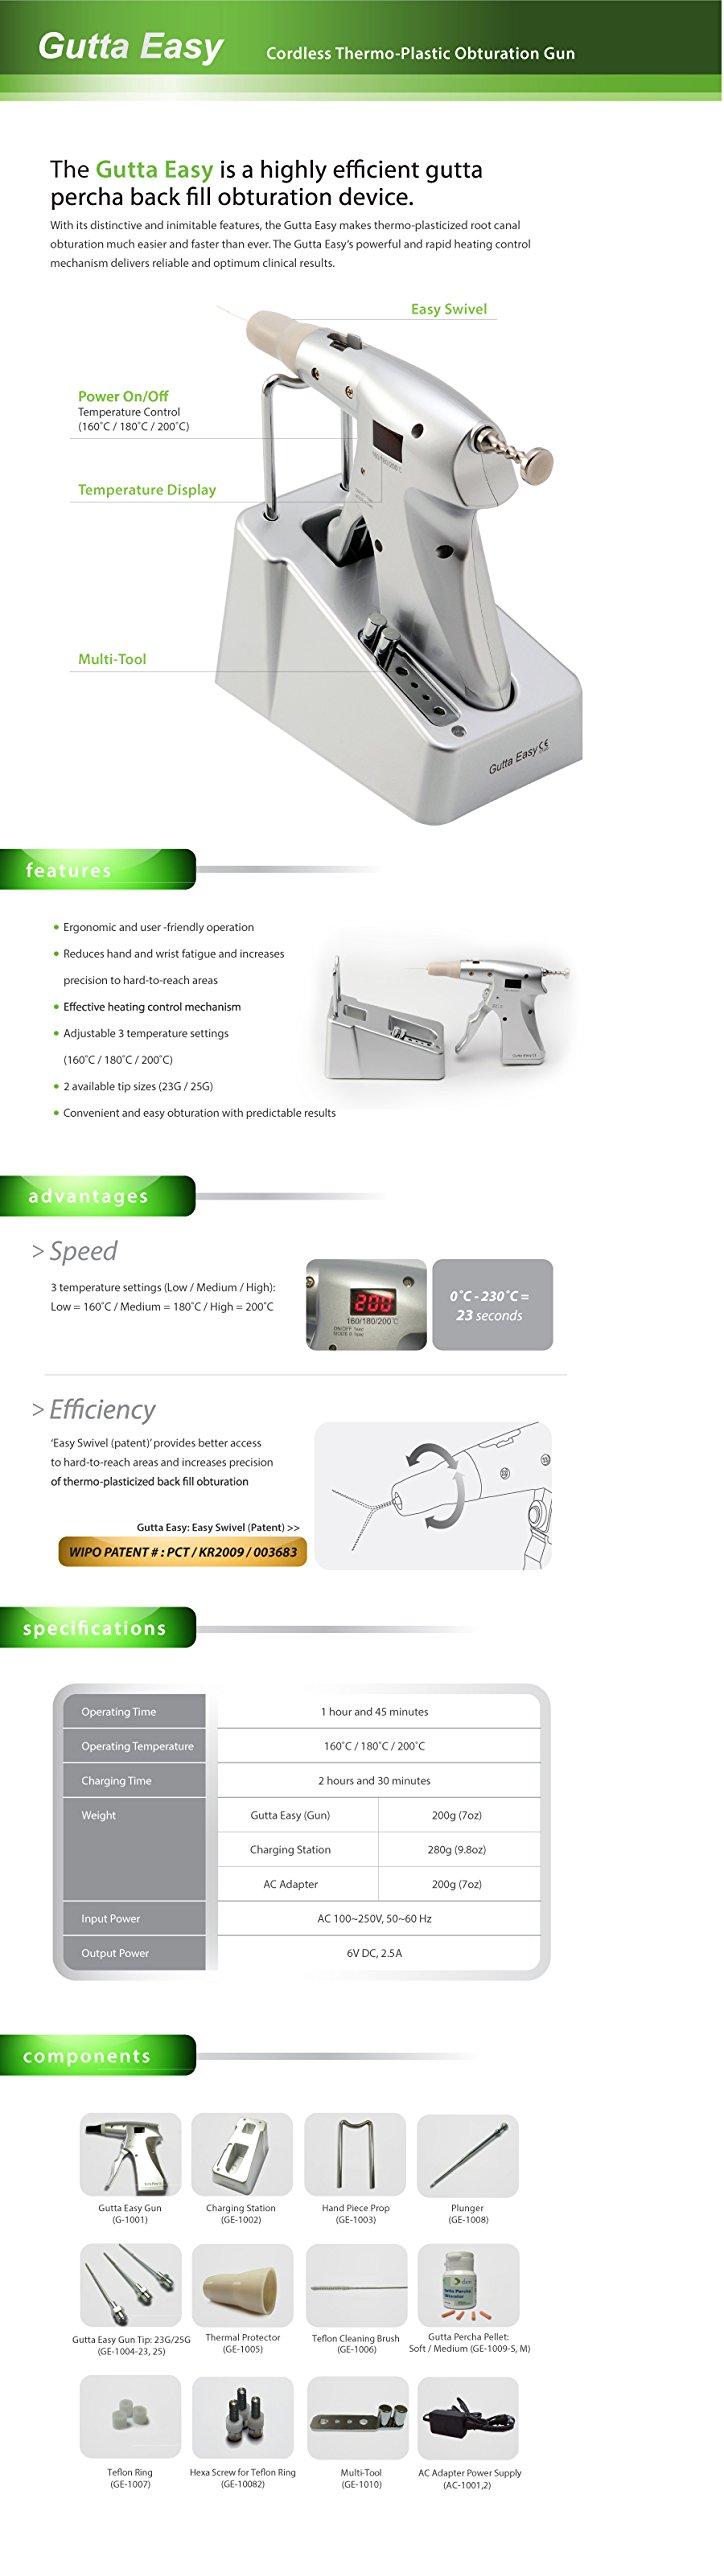 Gutta Easy : Endodontic Cordless Thermoplastic Obturation System Gun